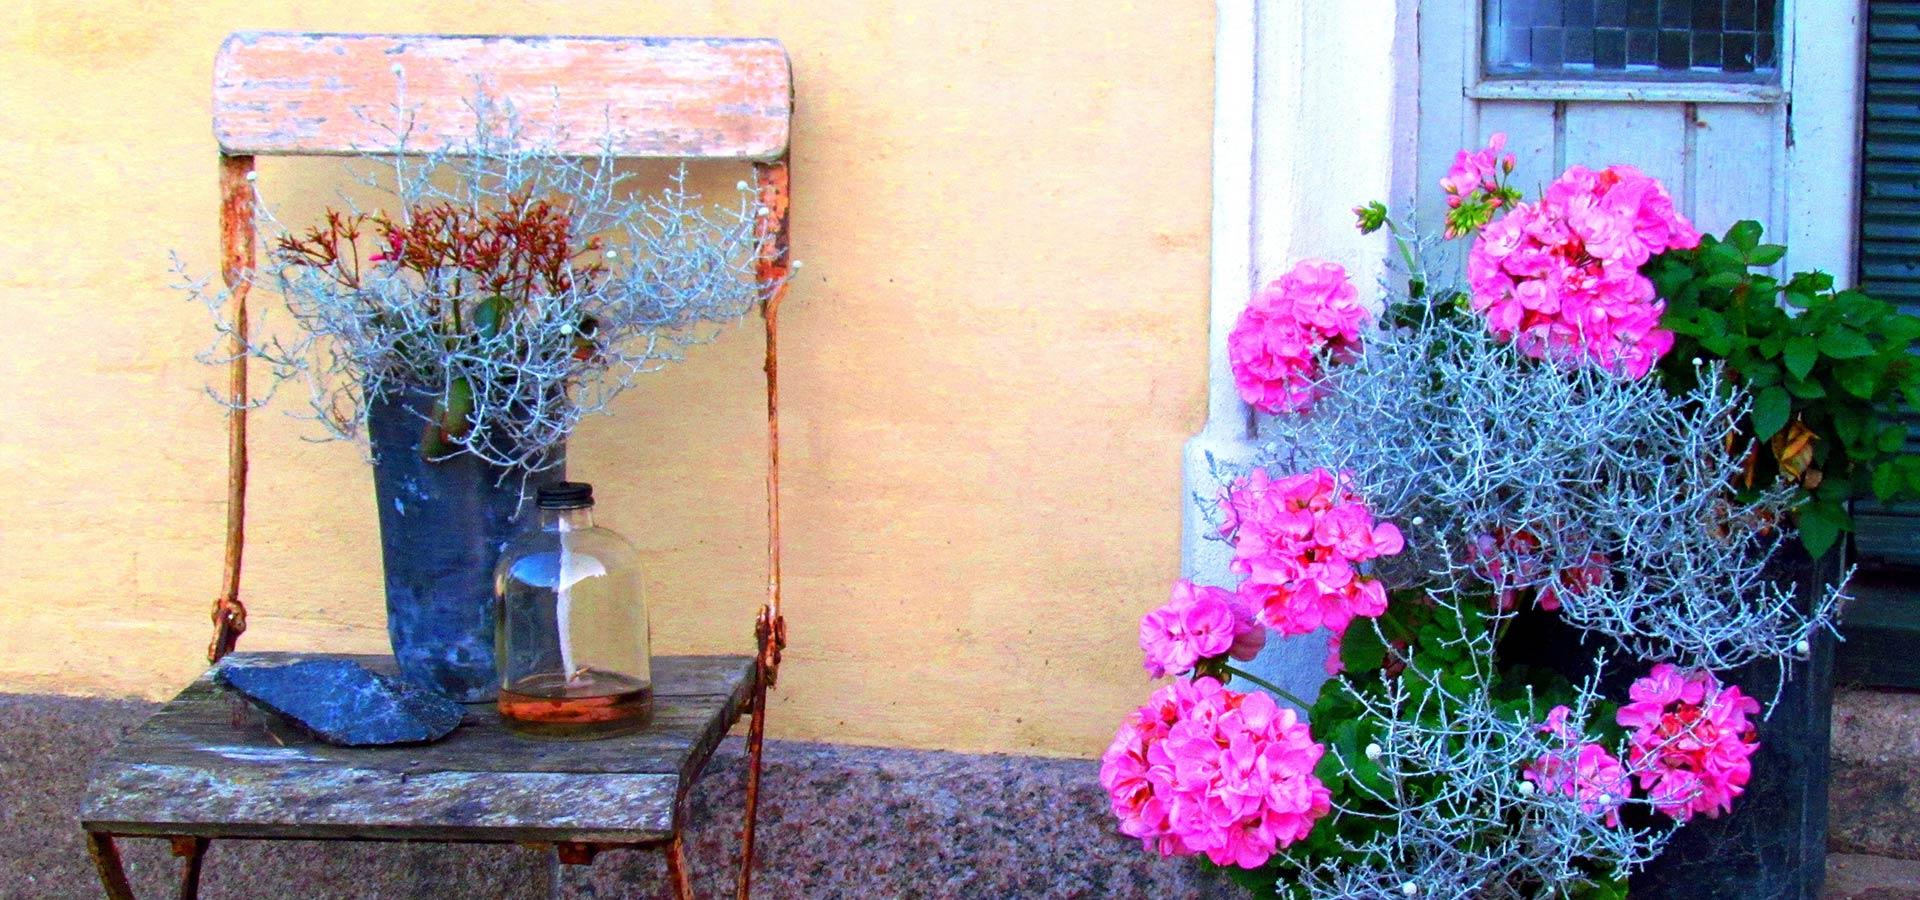 Garten g nstig gestalten bonava for Garten gunstig gestalten